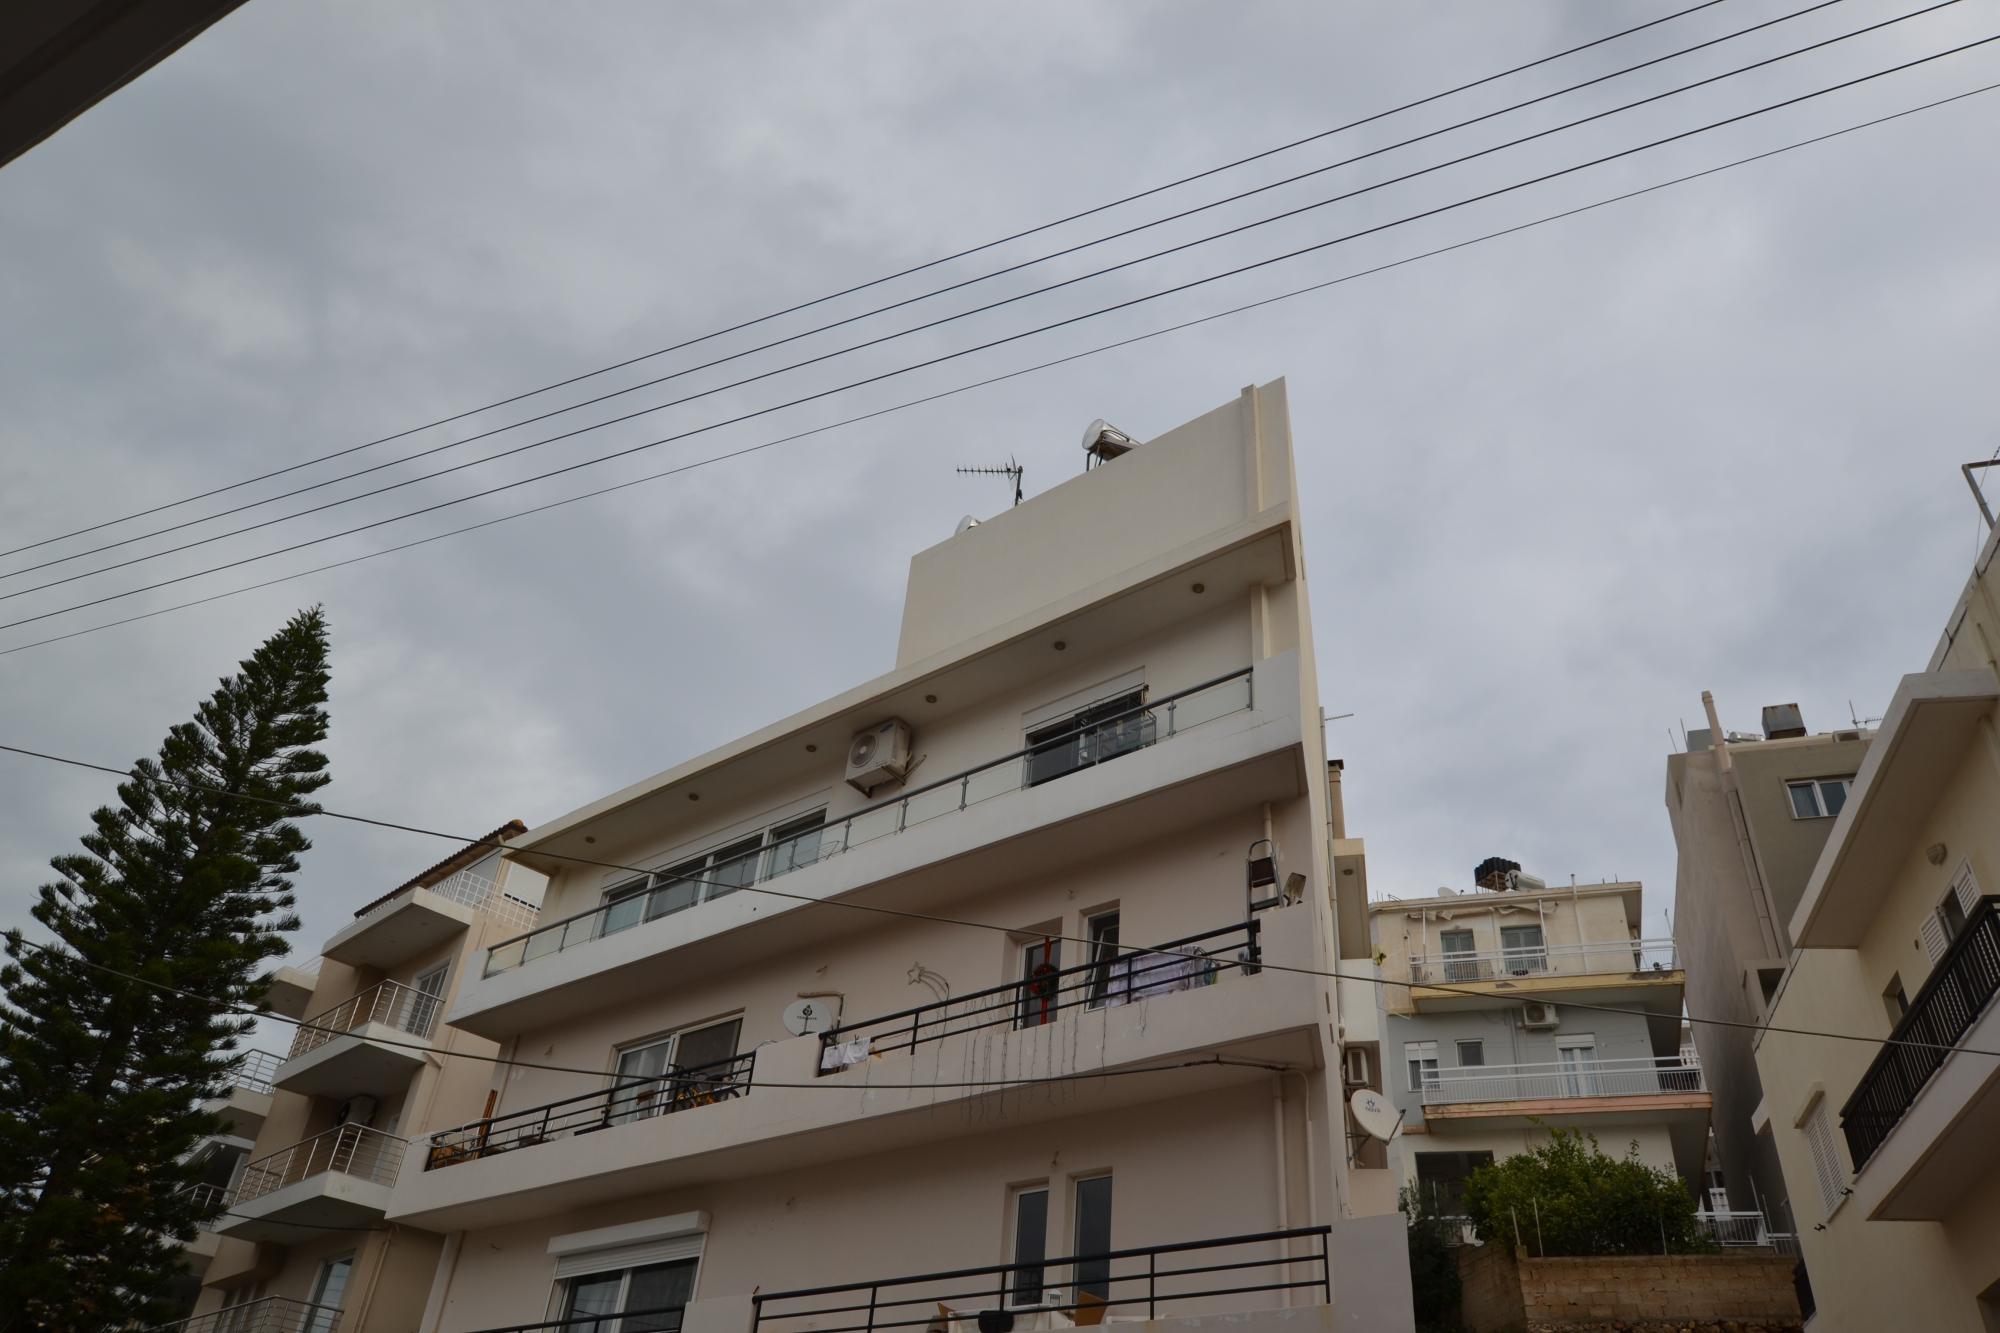 Impressive 4 bedroom maisonette apartment with large roof terrace.